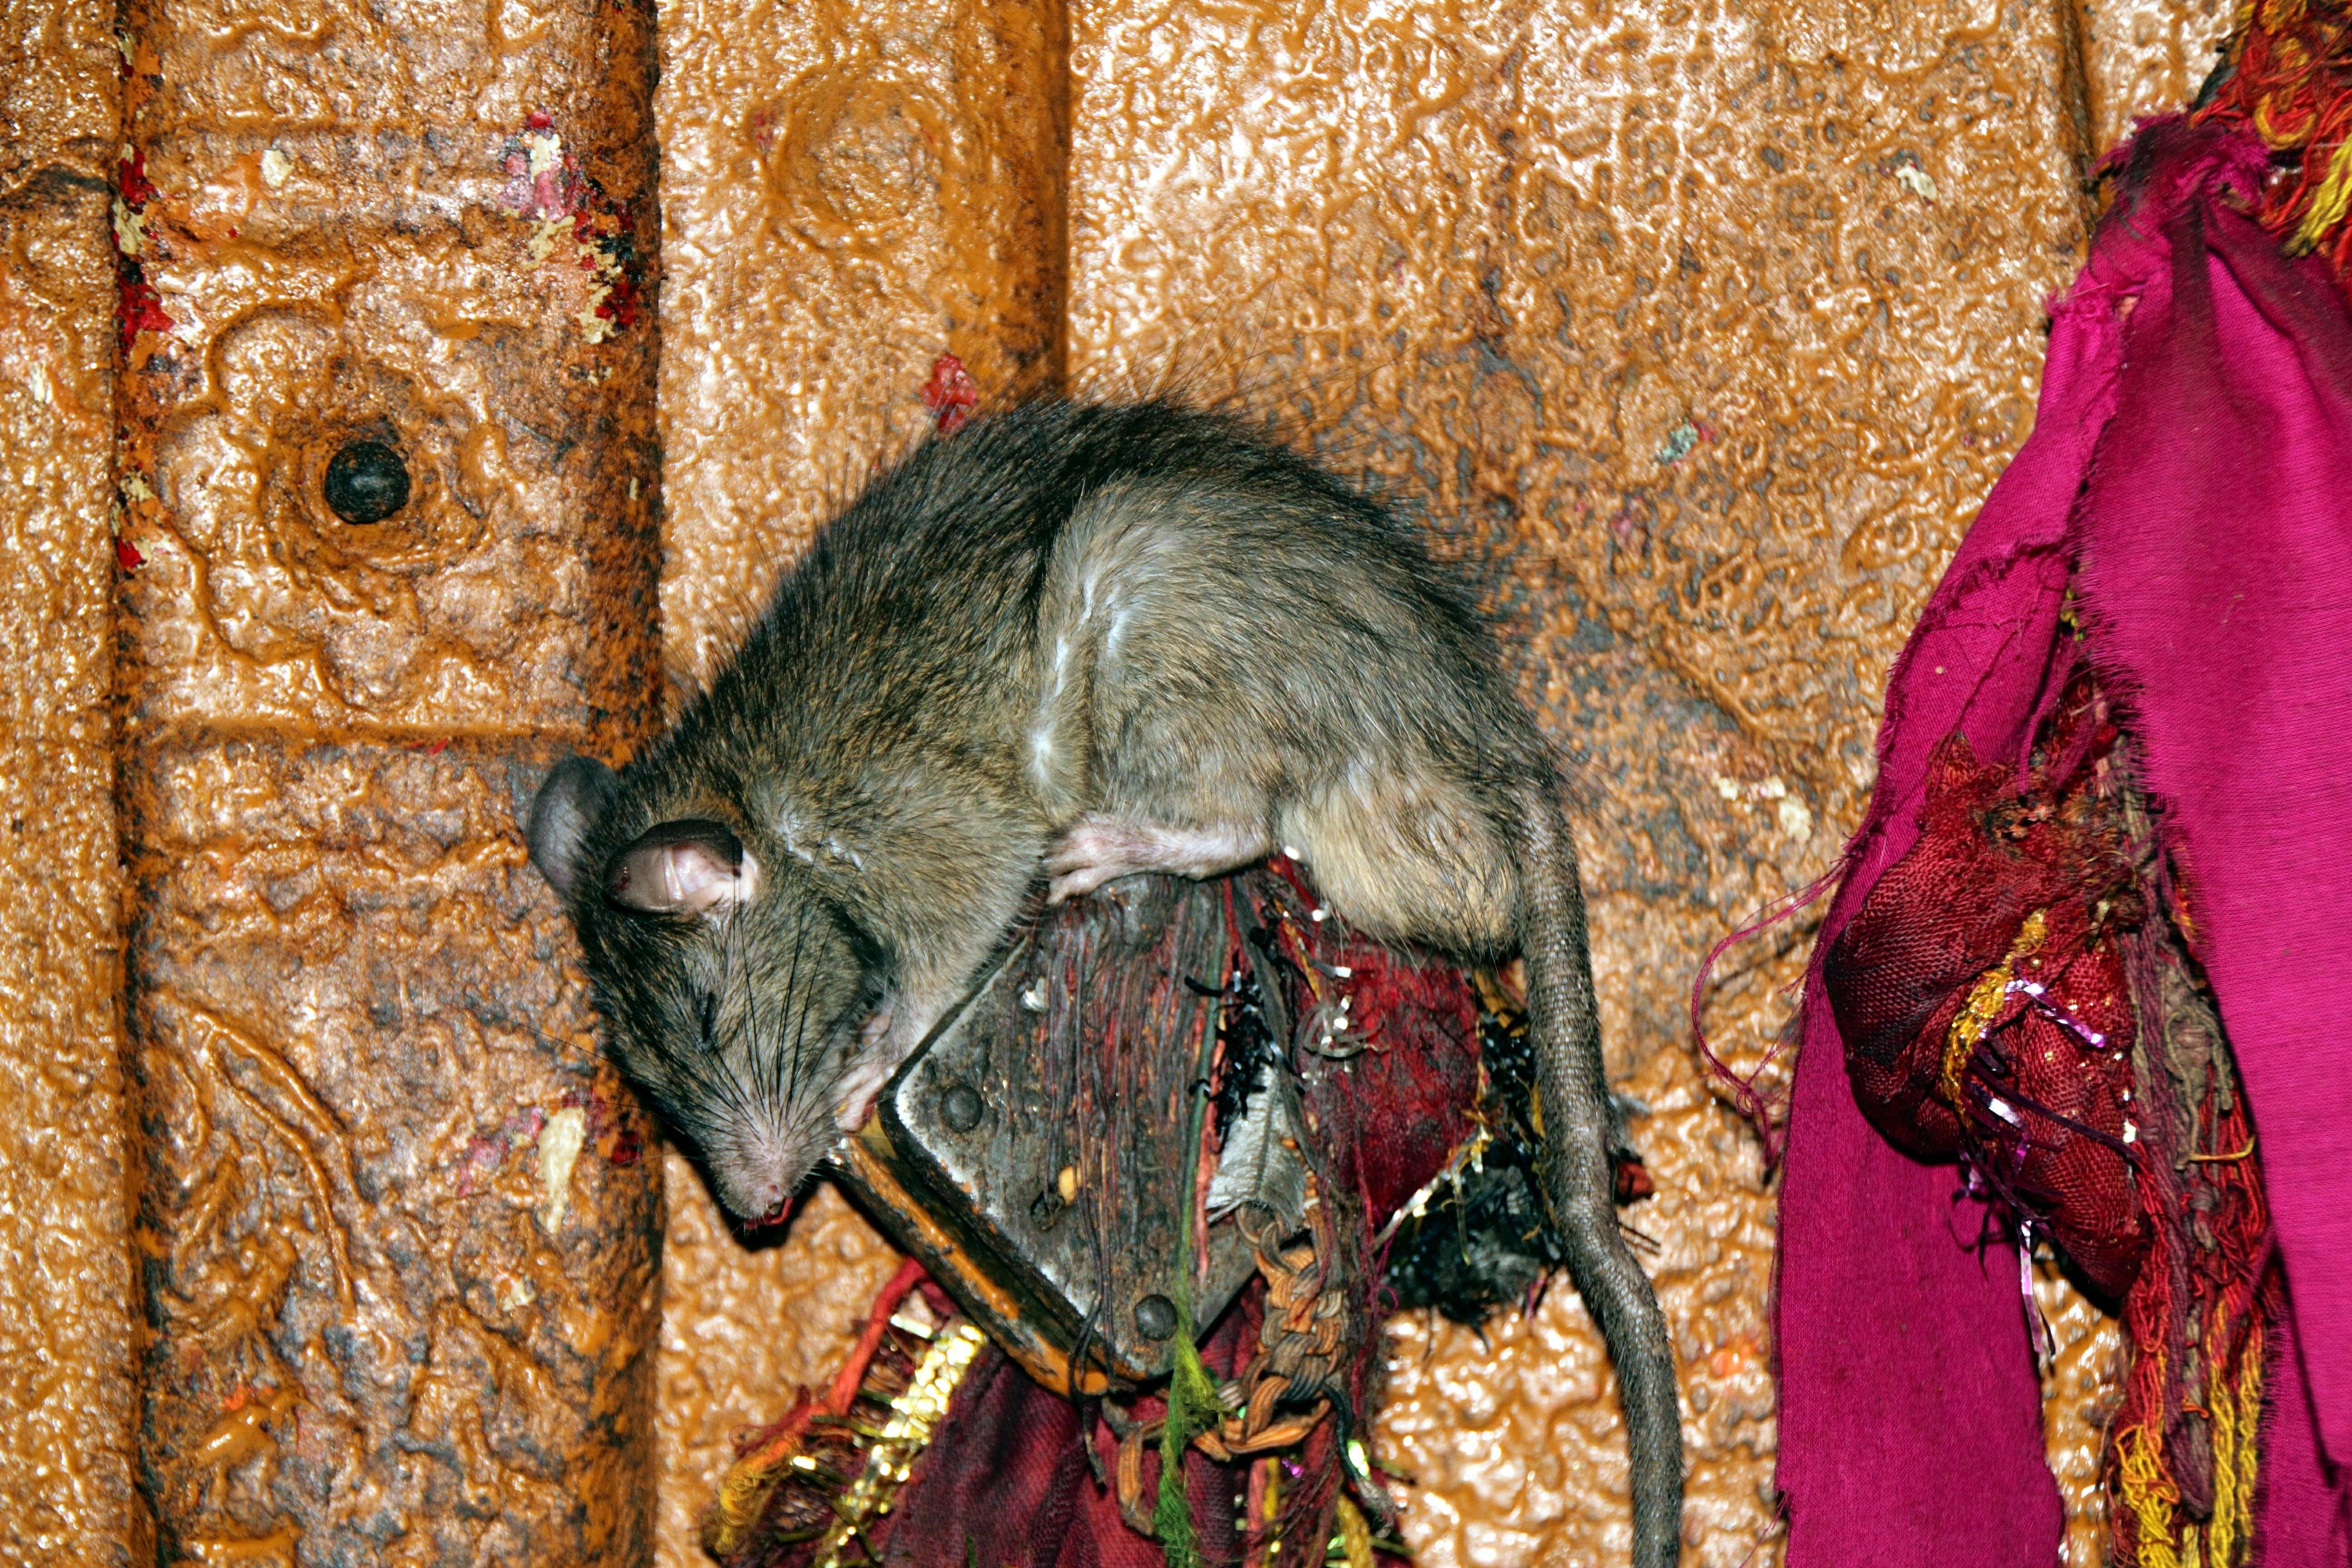 File:Sleeping kaba - Karni Mata Temple (8029425663) jpg - Wikimedia